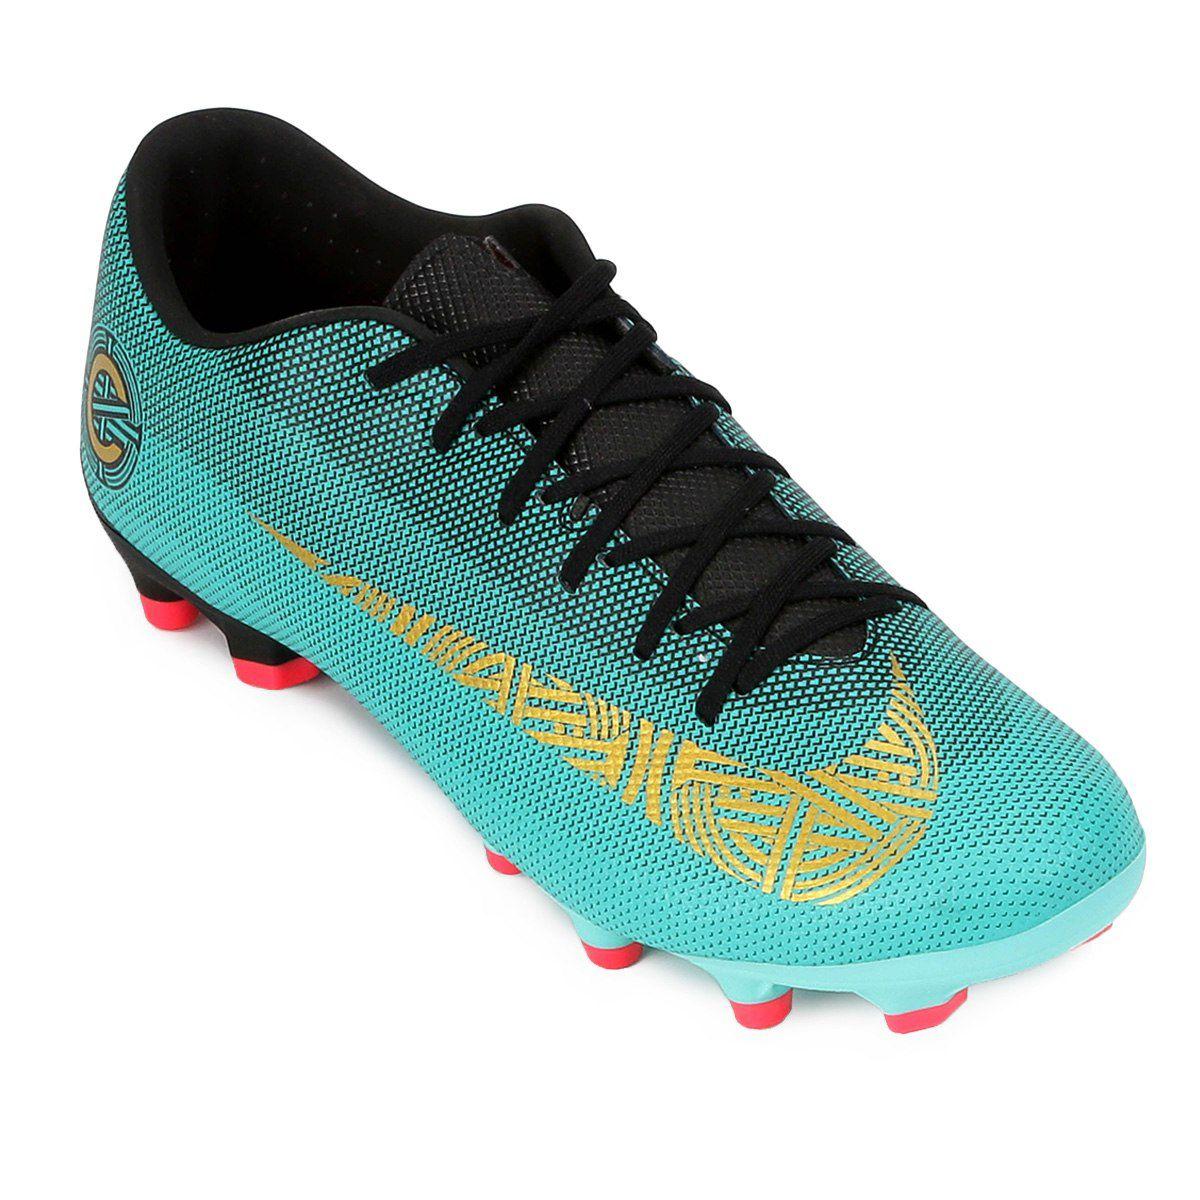 3d63b2618f Chuteira Campo Nike Mercurial Vapor 12 Academy Cr7 Mg - BRACIA SHOP ...